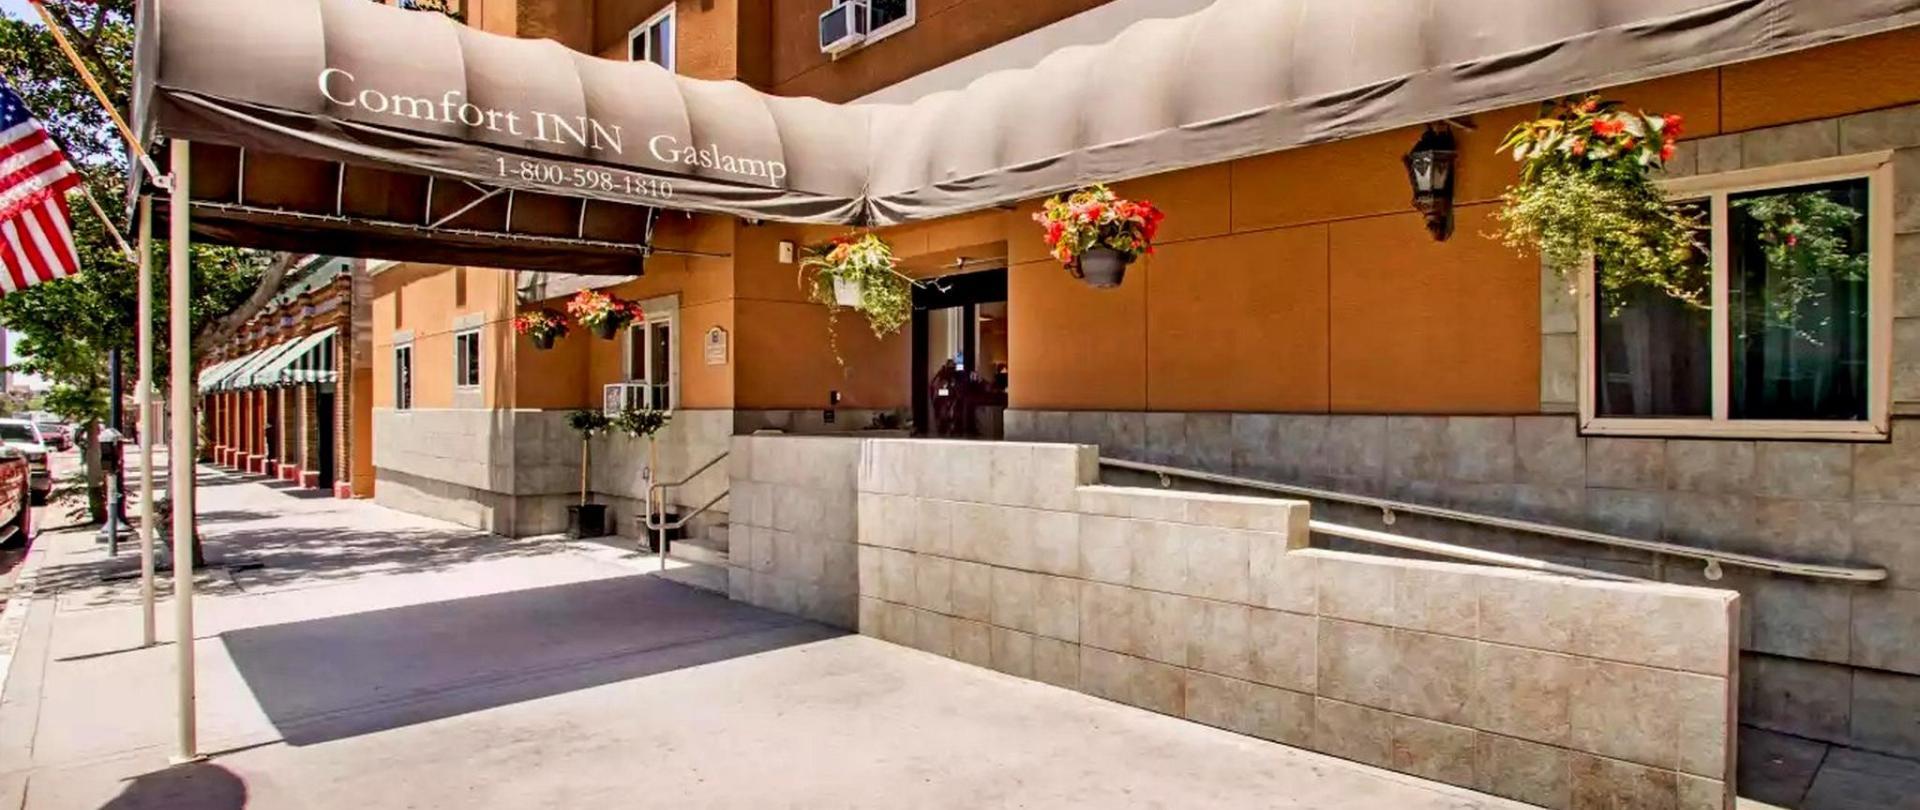 San Diego Comfort Inn Gaslamp Convention Center.jpg